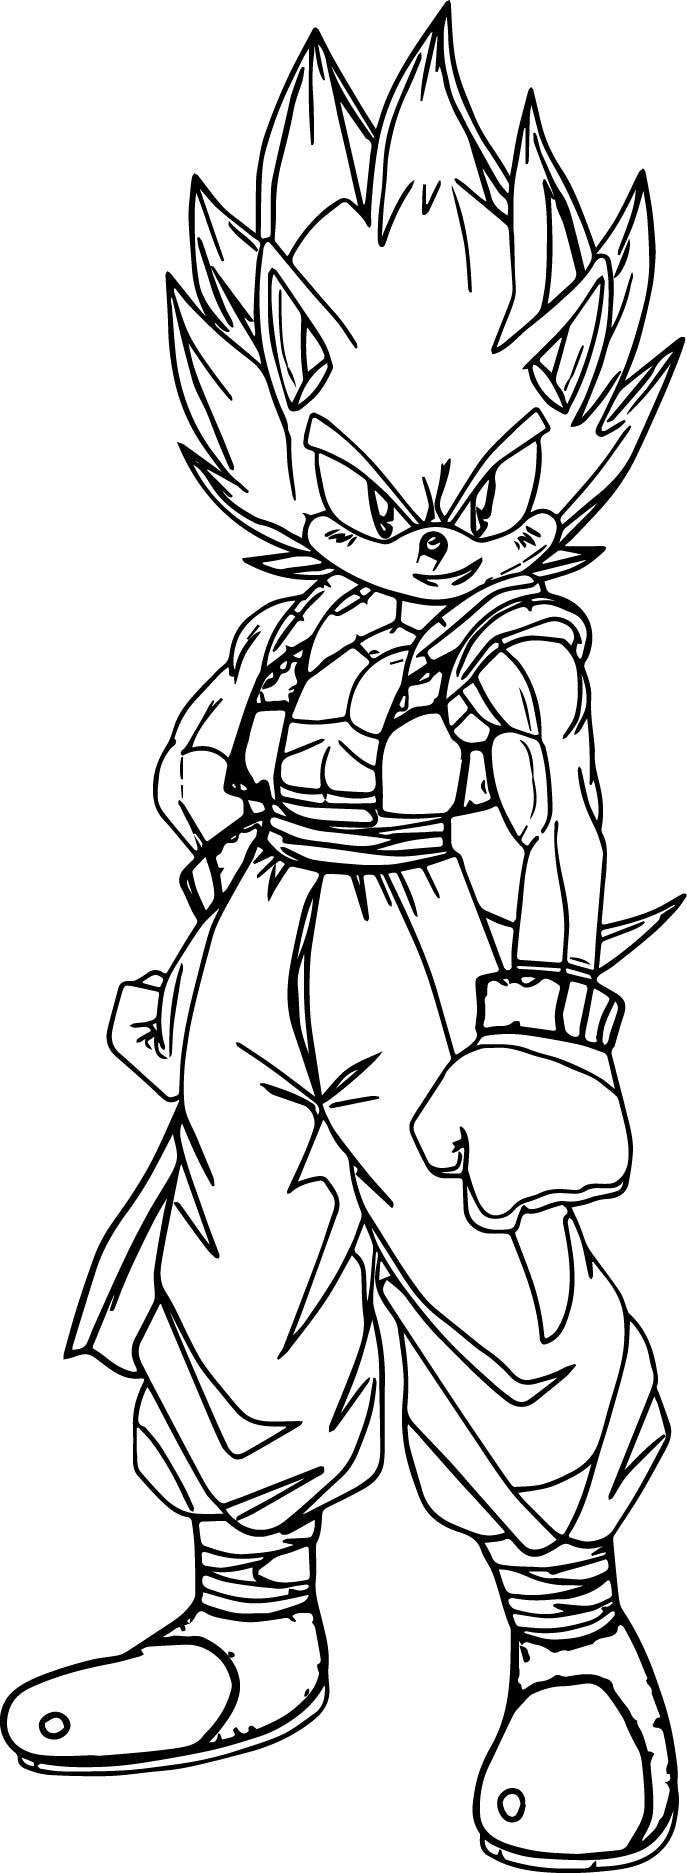 Goku Sonic Coloring Page Wecoloringpage